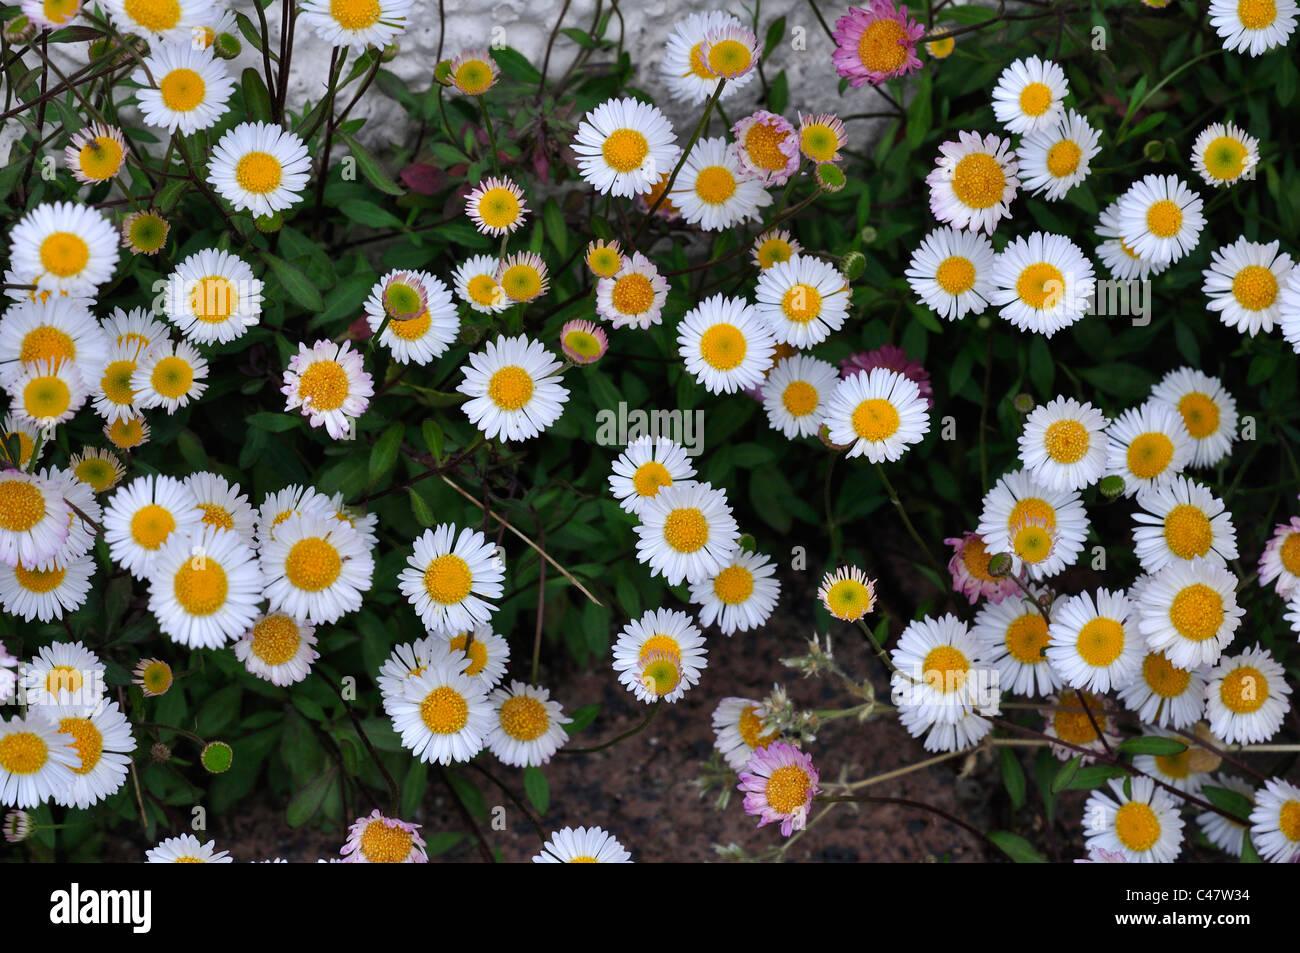 The tiny daisy like flowers of erigeron which self seeds happily in the tiny daisy like flowers of erigeron which self seeds happily in the rockery area of the garden uk izmirmasajfo